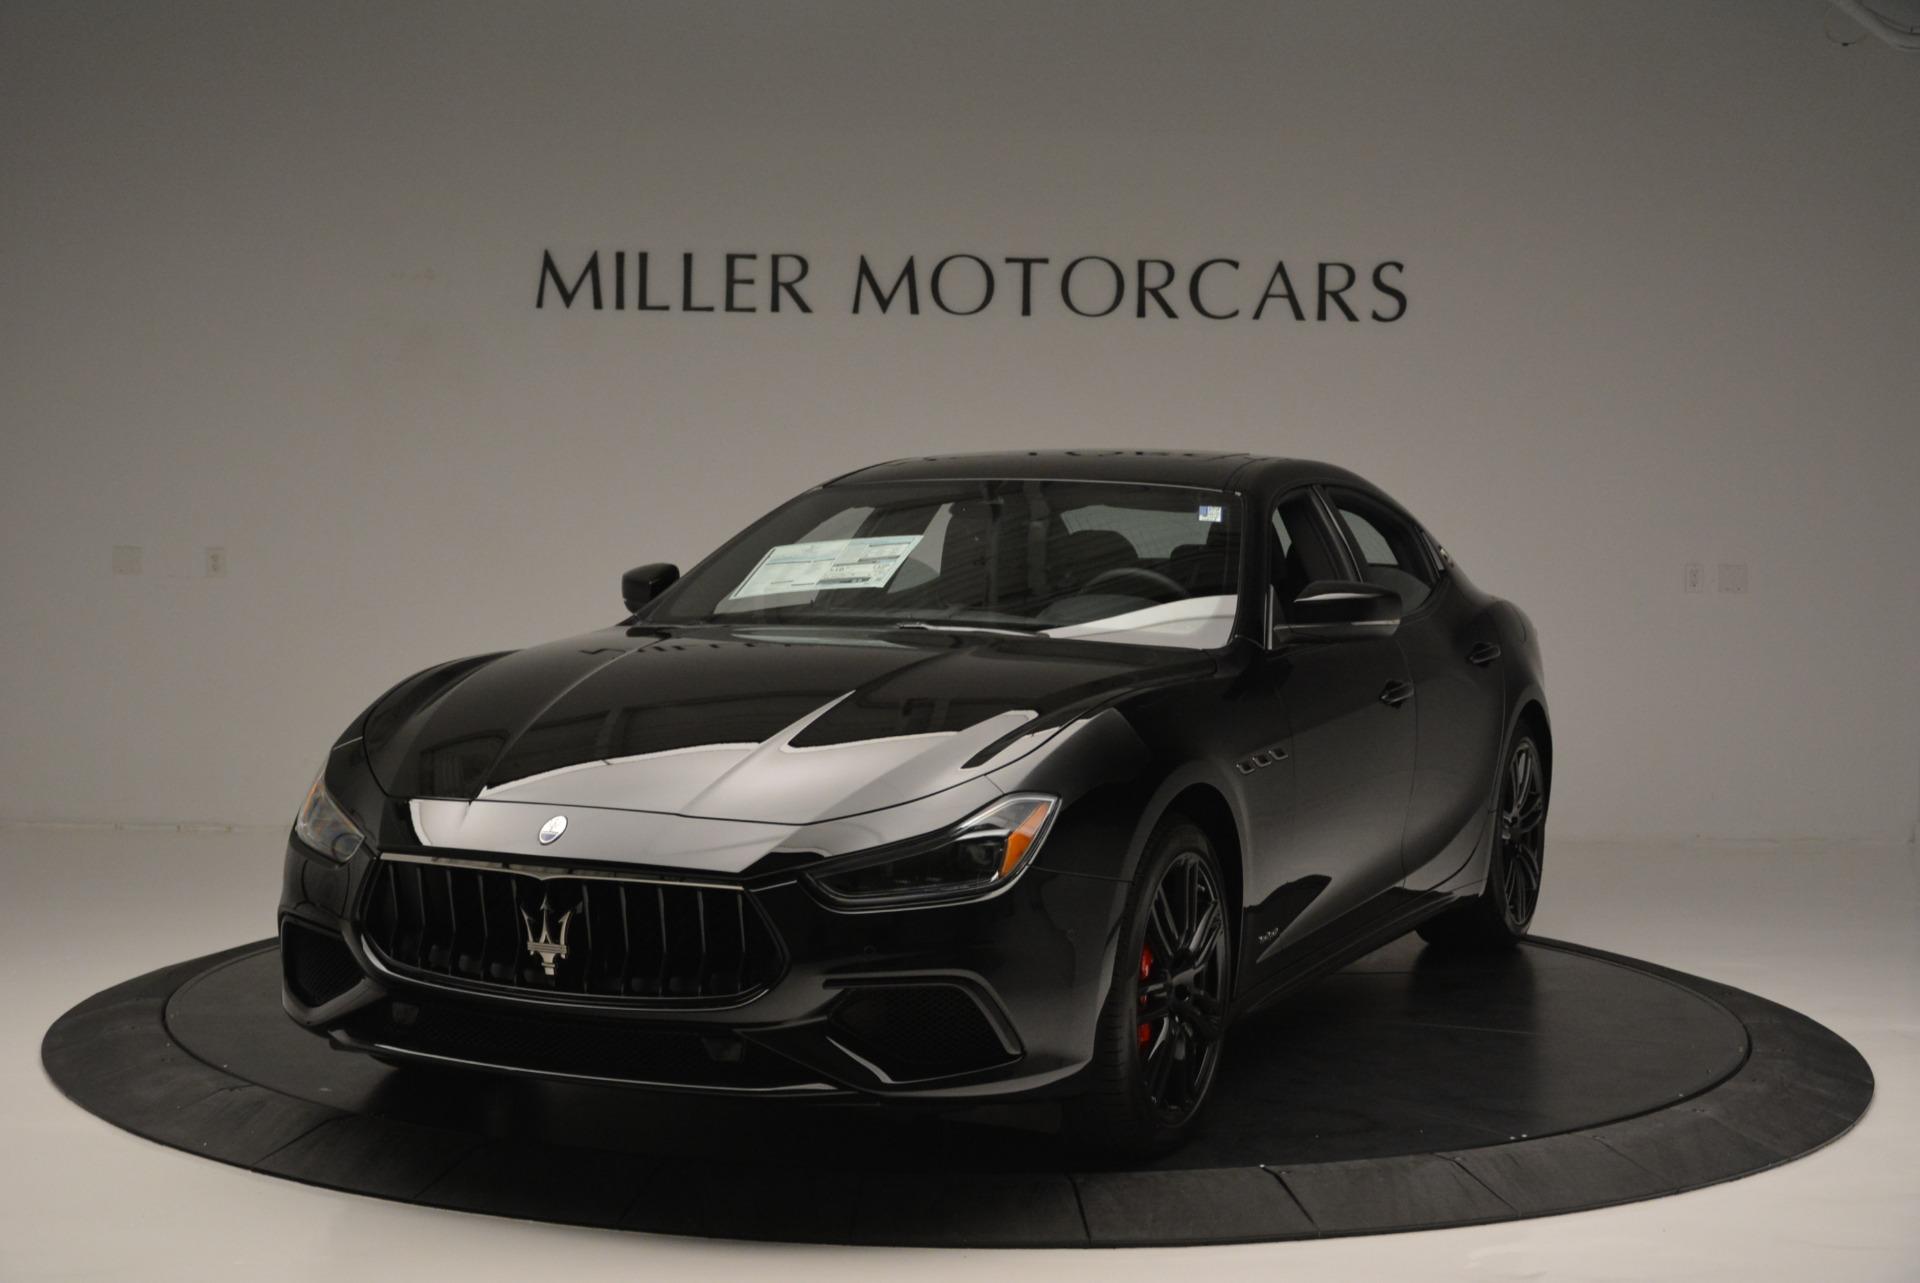 New 2018 Maserati Ghibli SQ4 GranSport Nerissimo For Sale In Westport, CT 2372_main